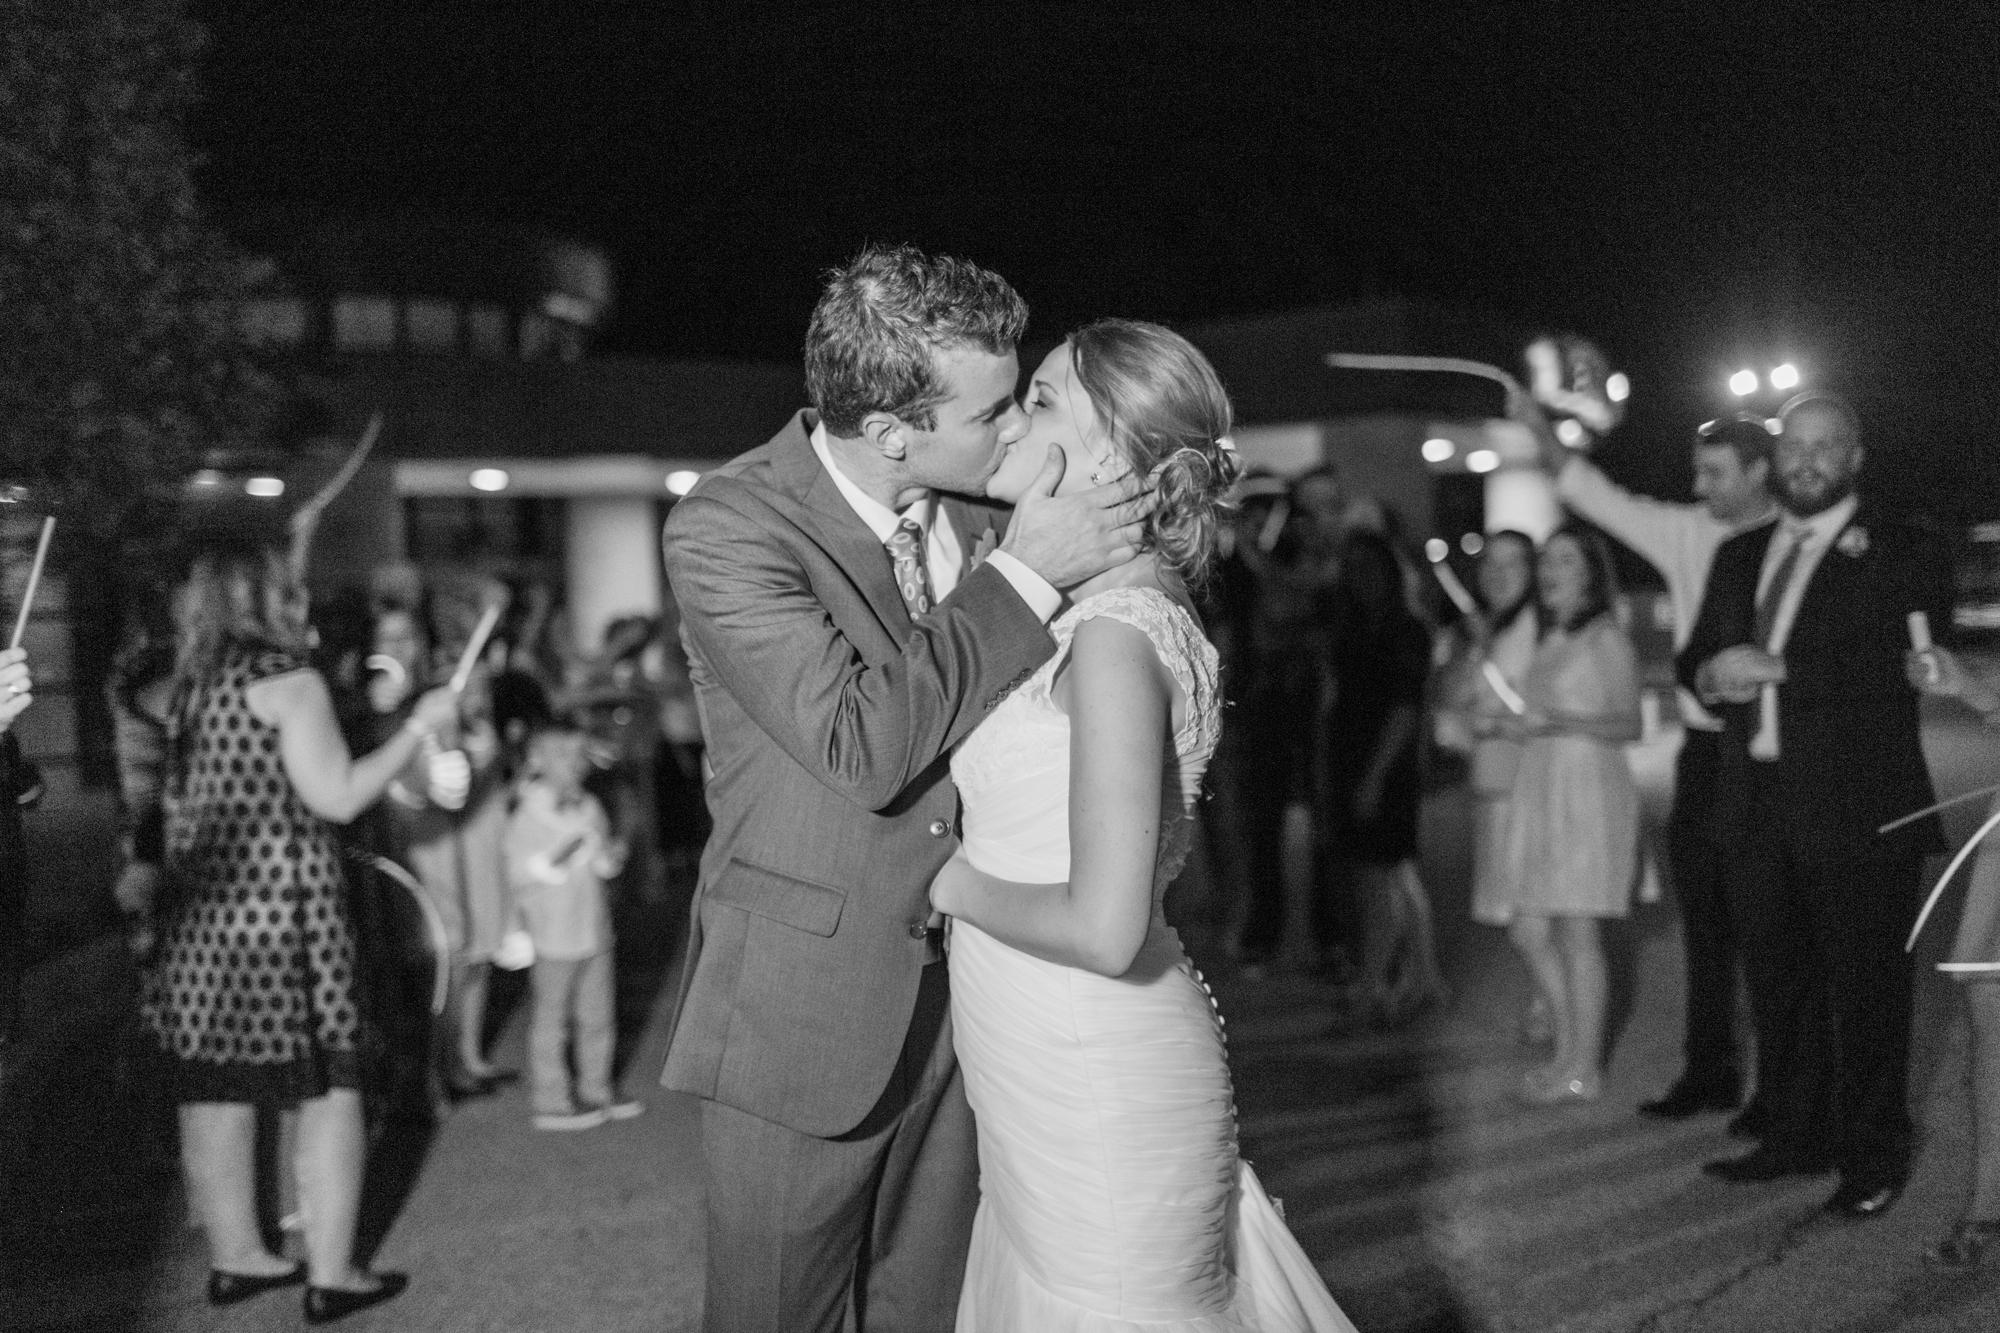 gaywedding-830.jpg